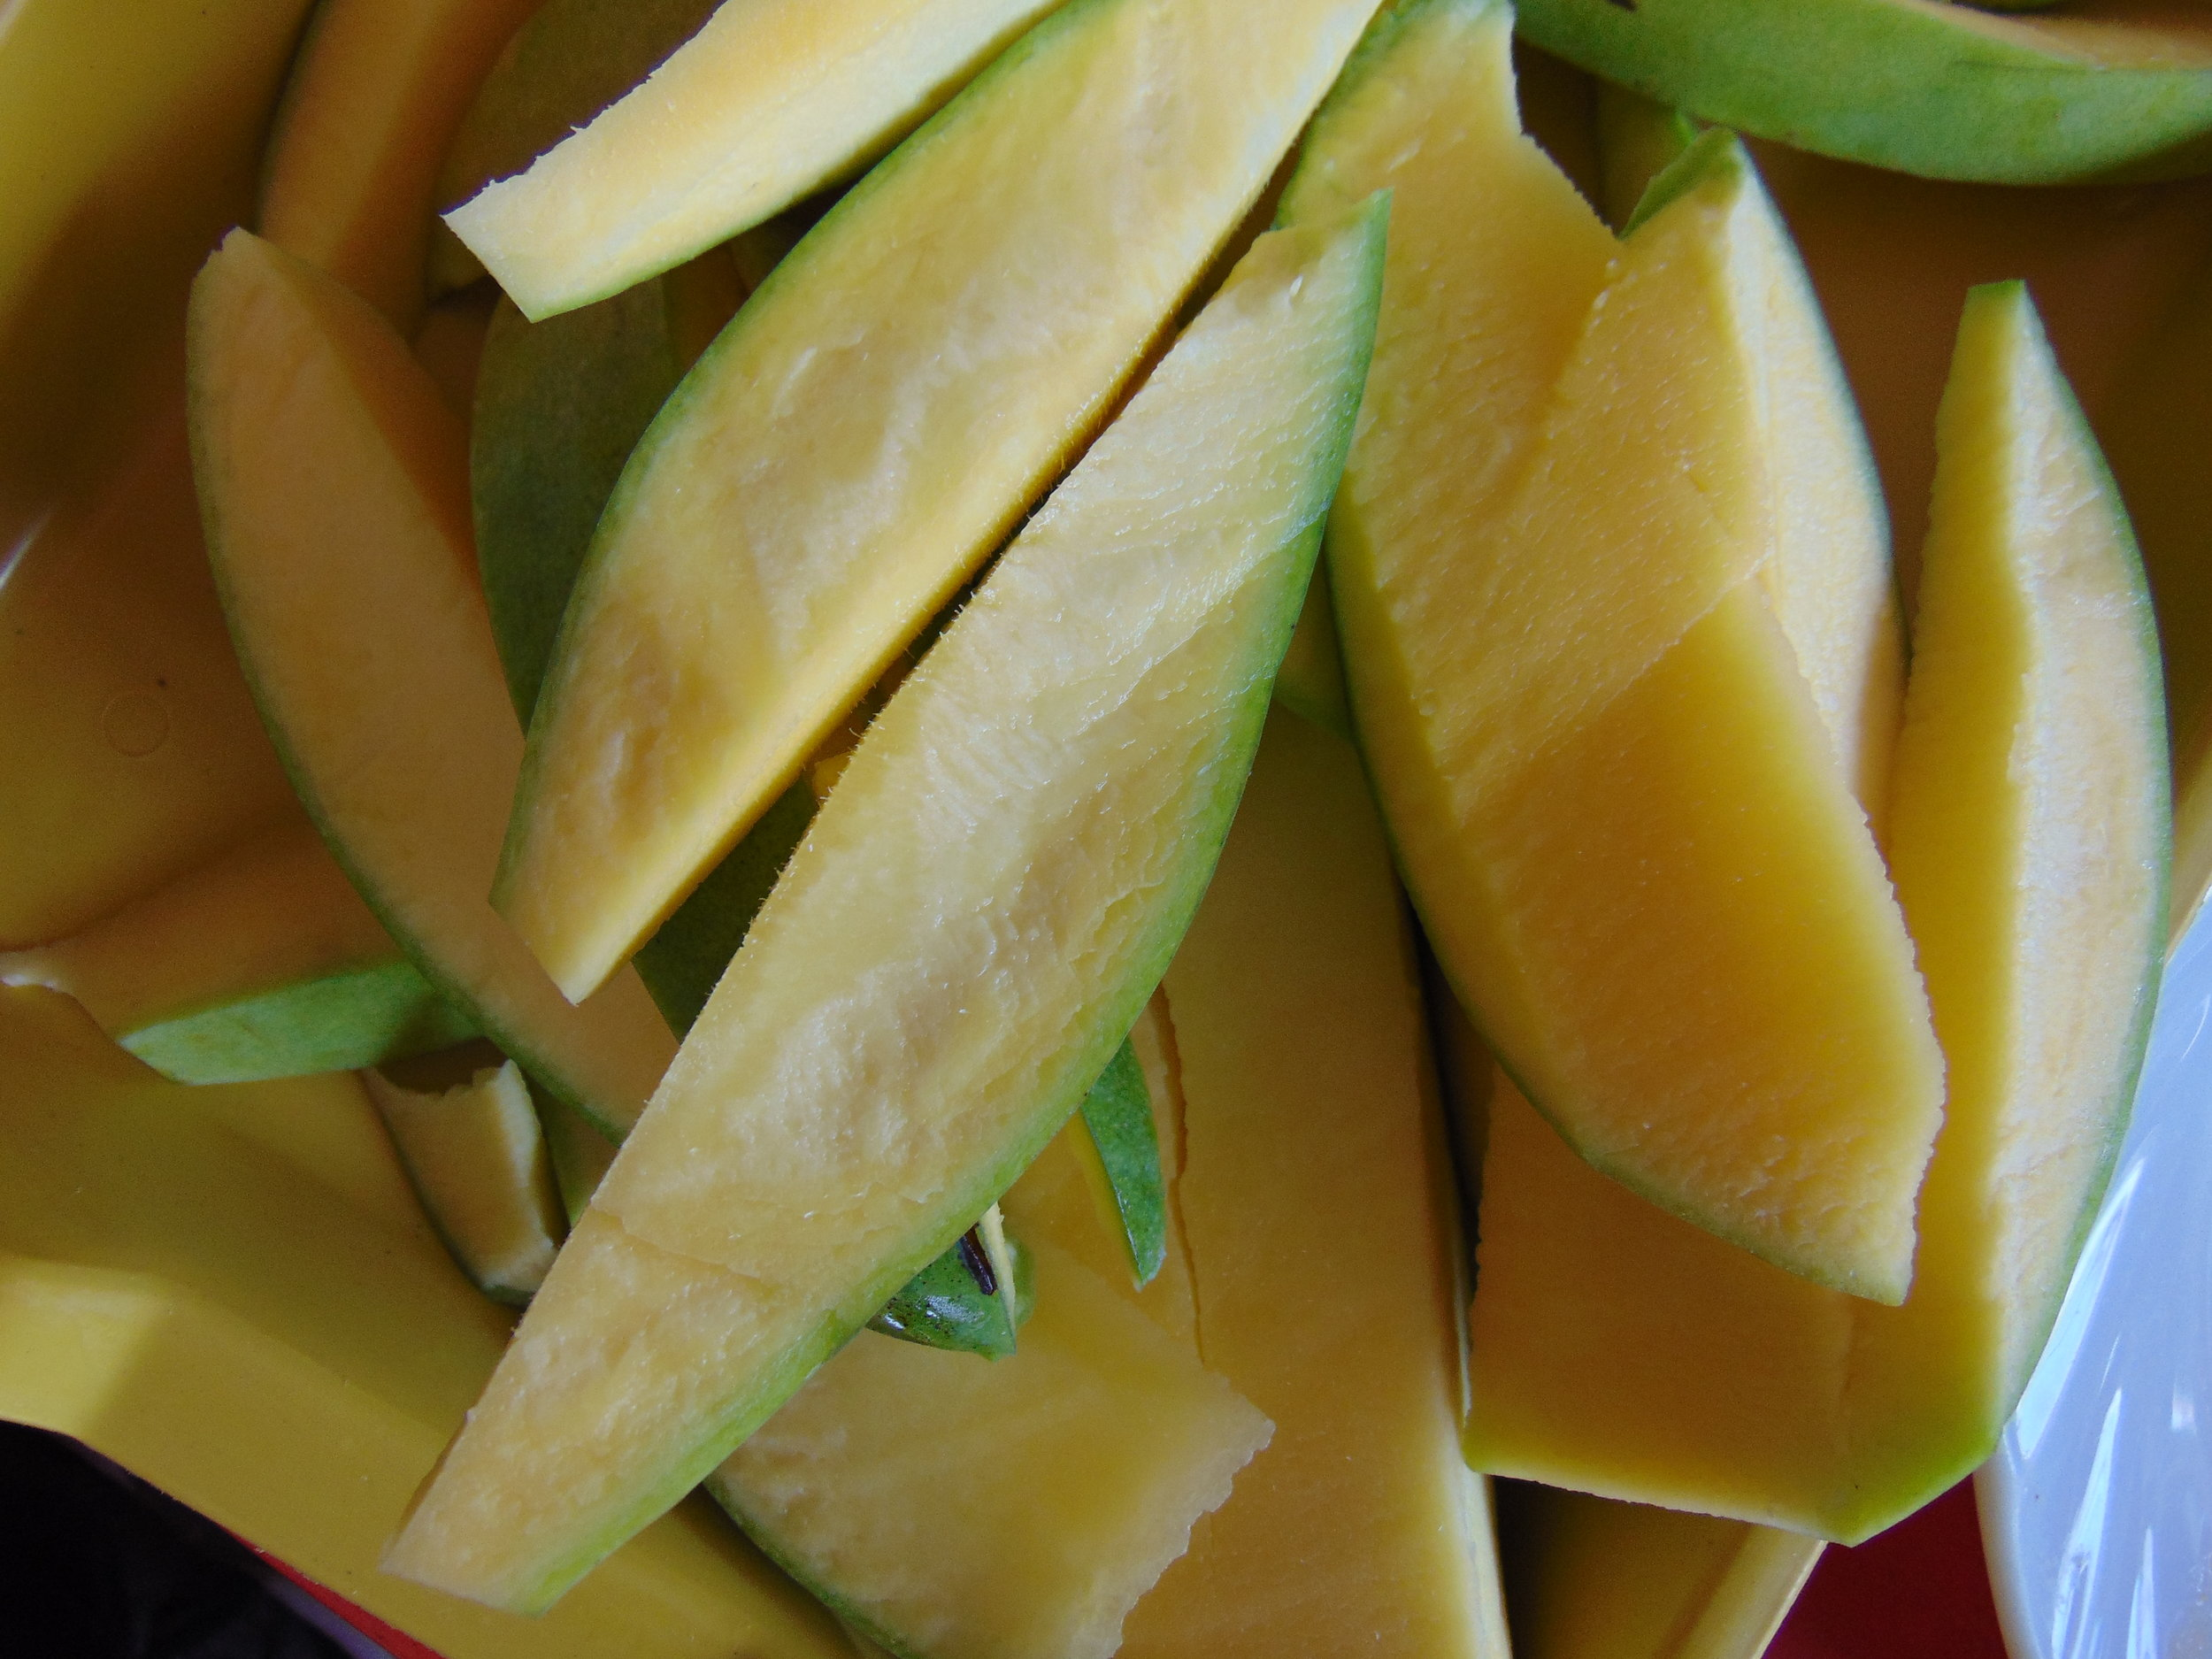 Green Mango: just add chili salt, and enjoy!